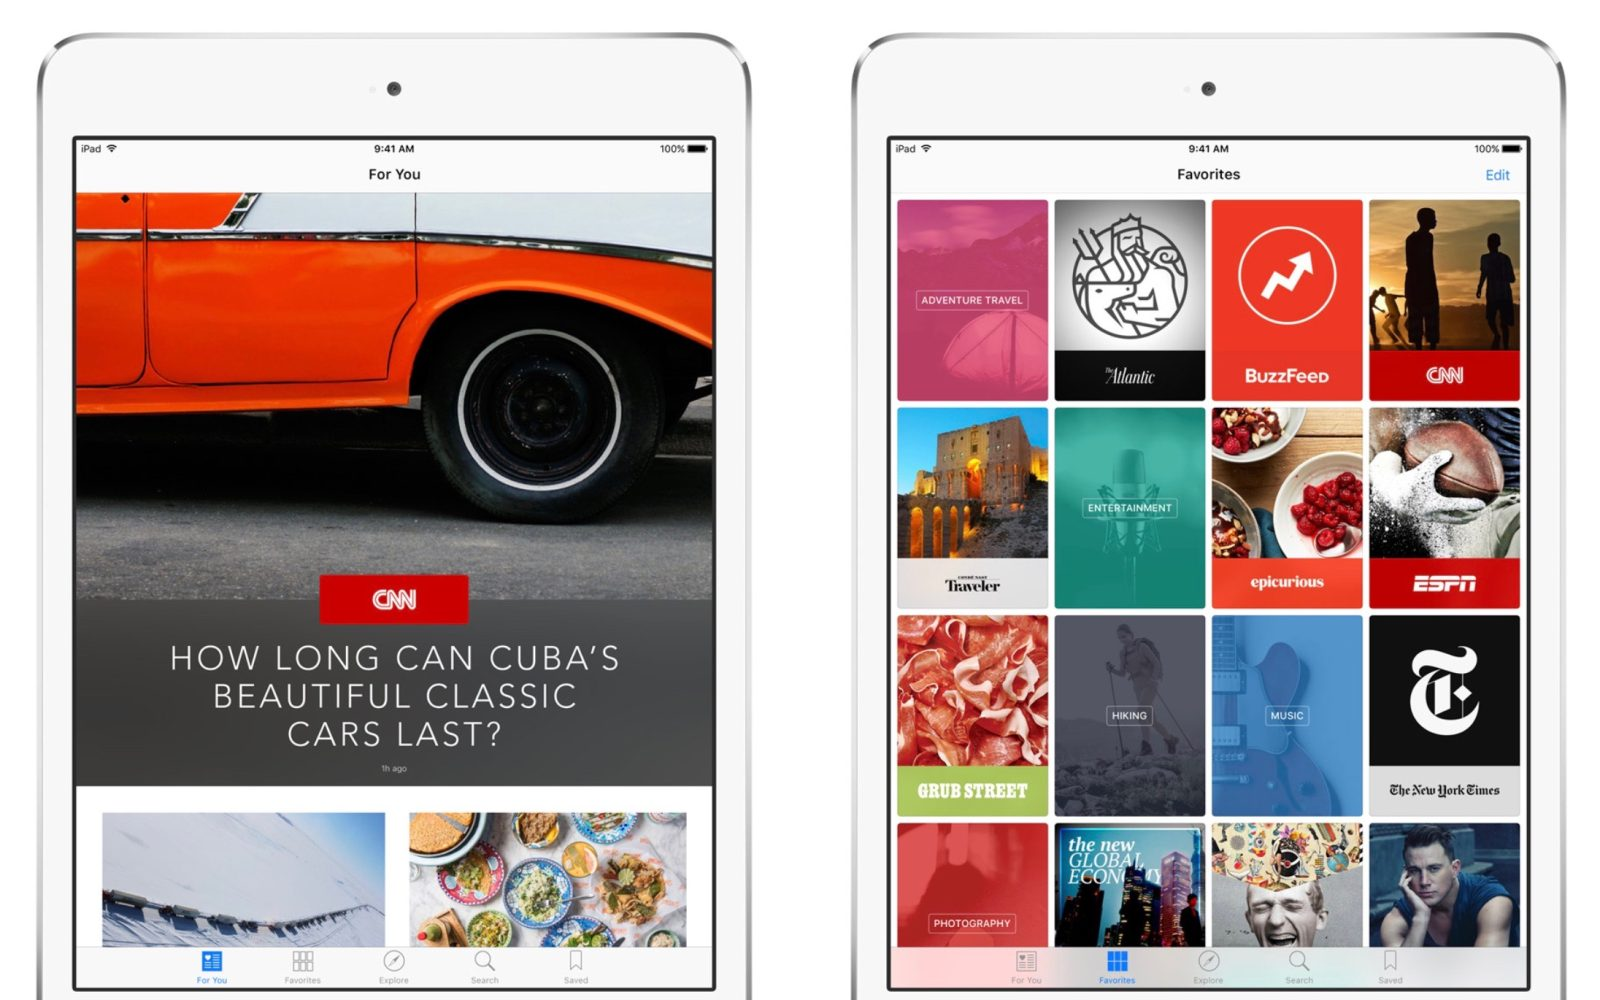 New jailbreak tweak brings Apple News to unsupported countries